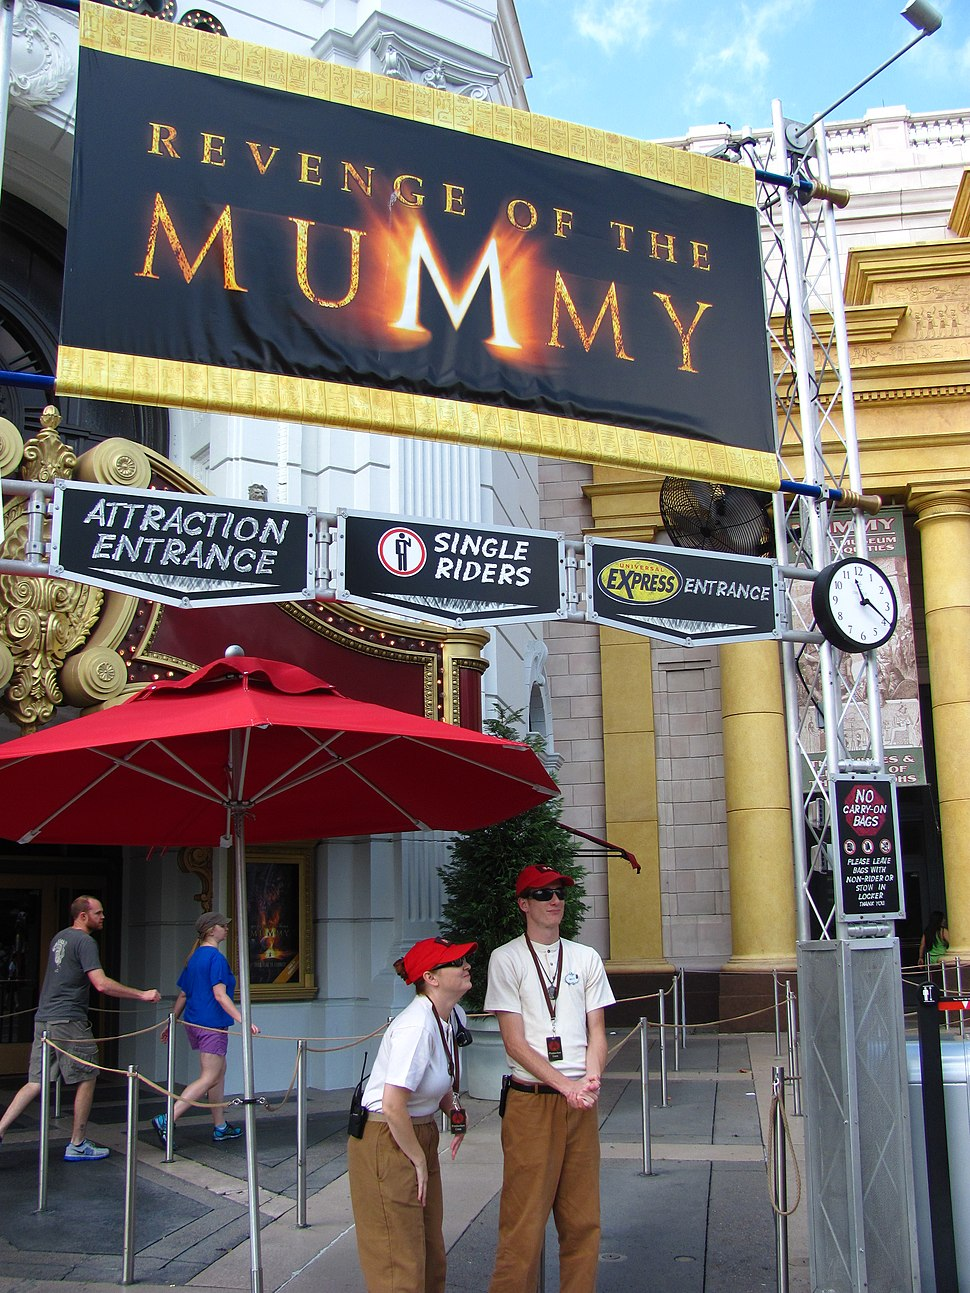 Revenge of the Mummy (Universal Studios Florida) entrance